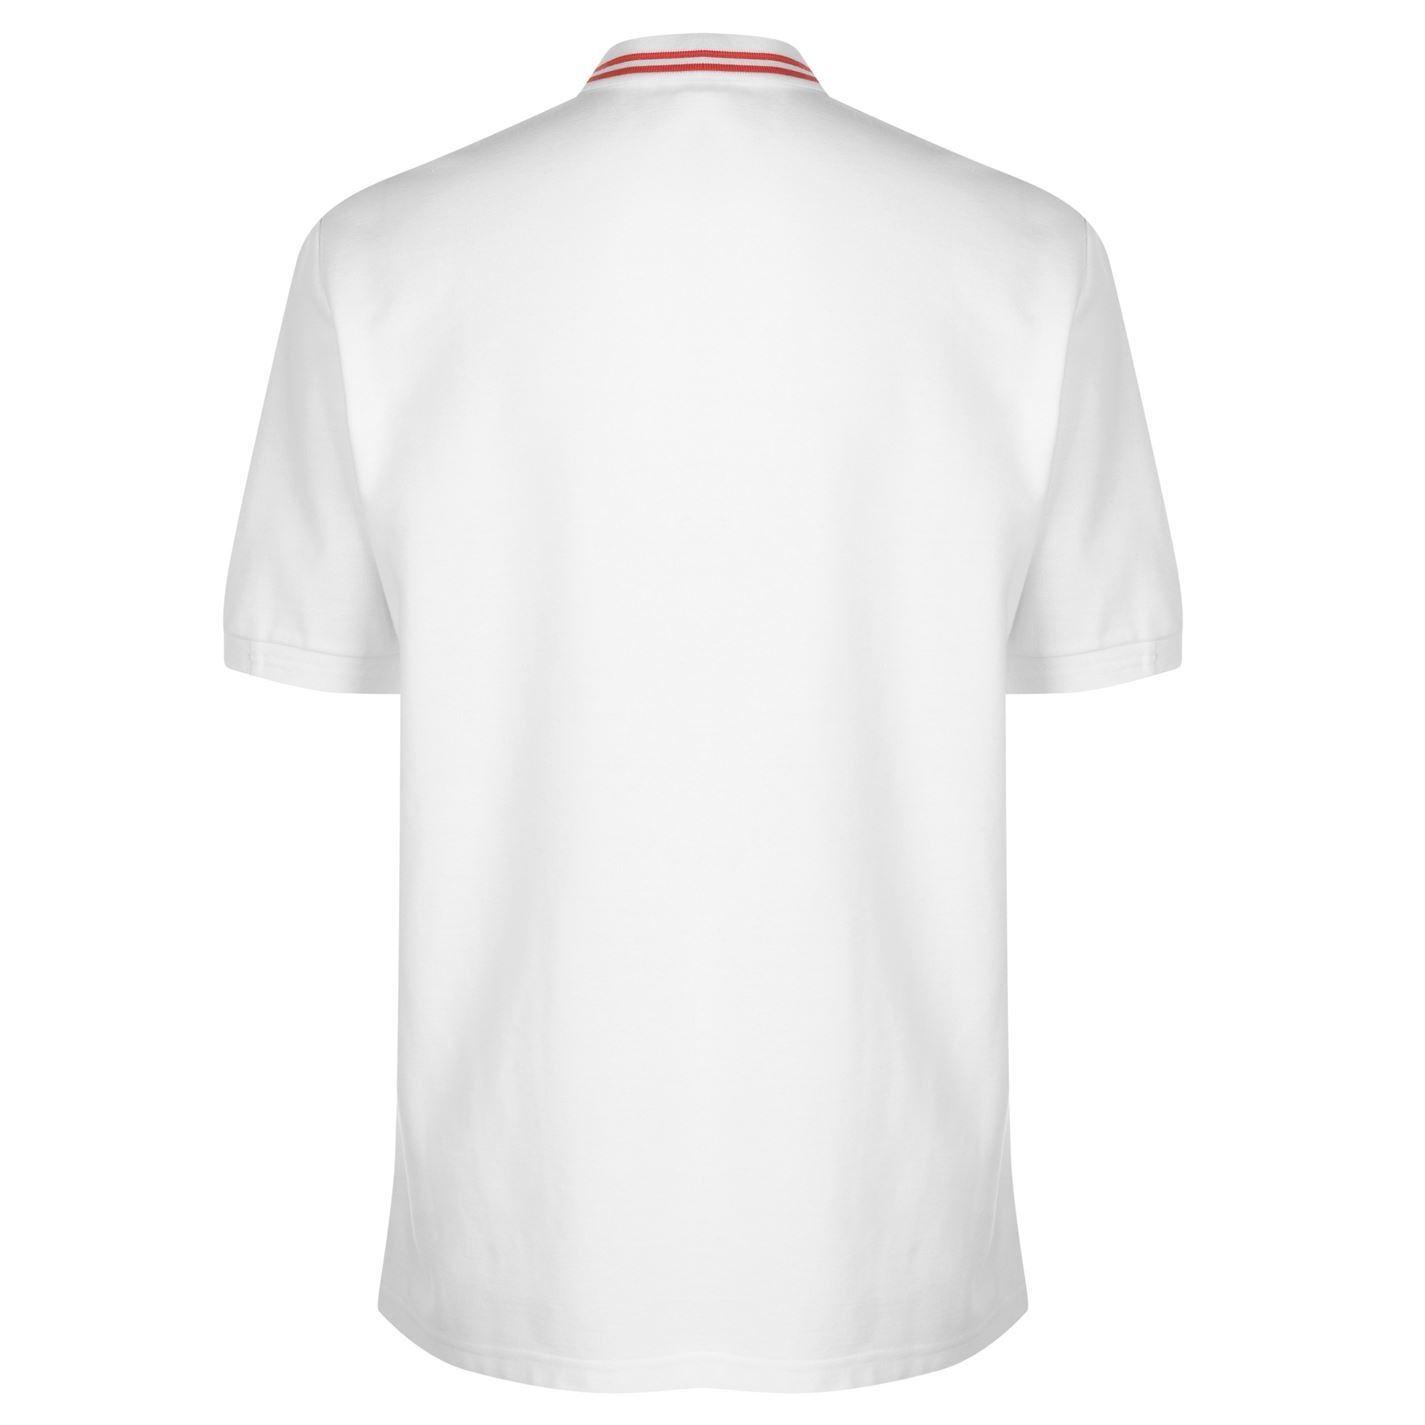 miniature 15 - FIFA Coupe du monde 2018 Angleterre Polo Shirt Homme Football Soccer Top T-Shirt Tee